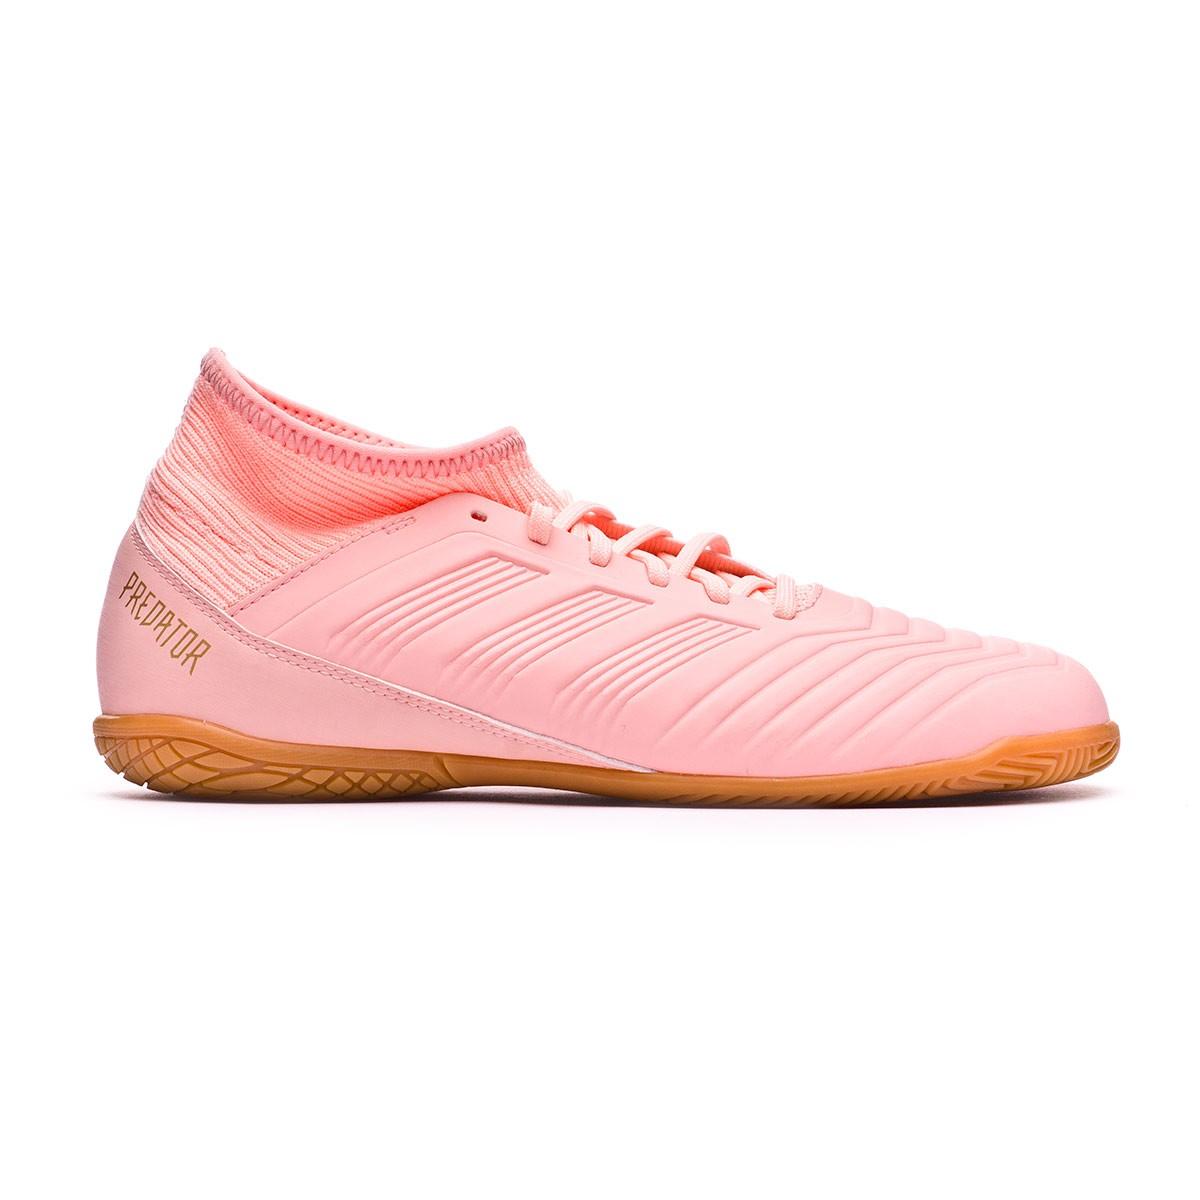 b4430f9cb11 Futsal Boot adidas Kids Predator Tango 18.3 IN Clear orange-Trace pink -  Football store Fútbol Emotion